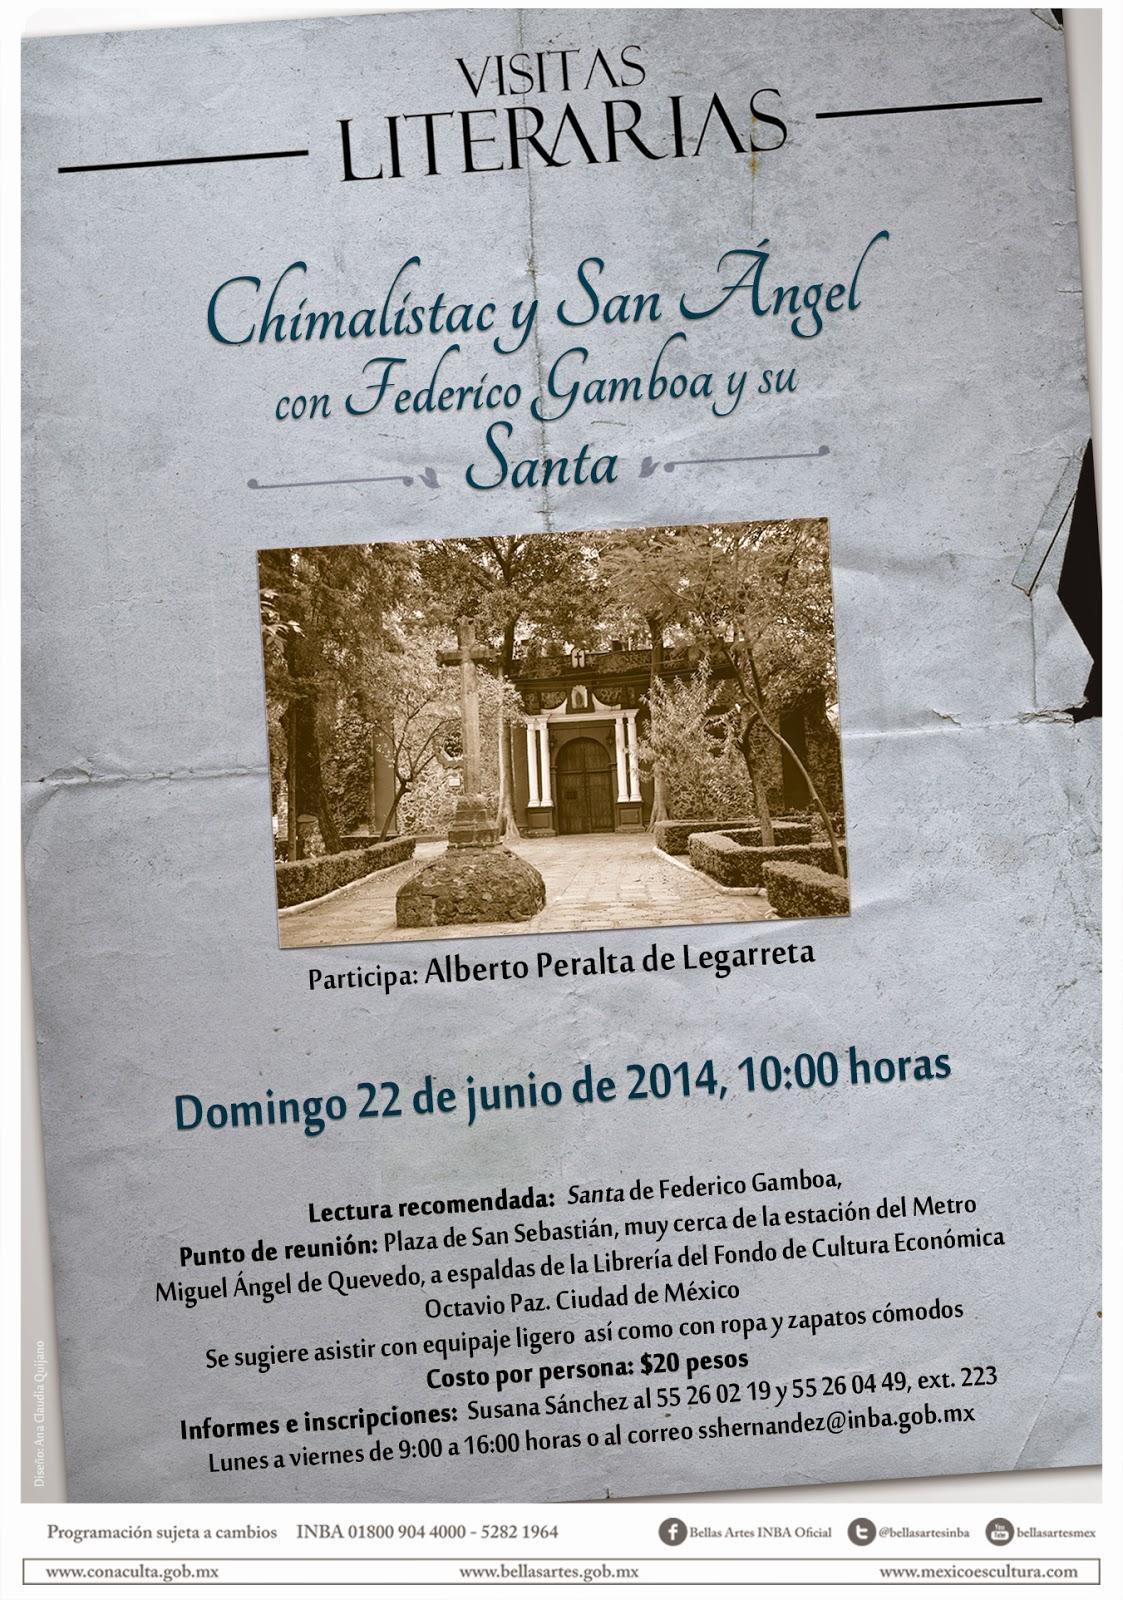 Visita literaria a San Ángel con Federico Gamboa